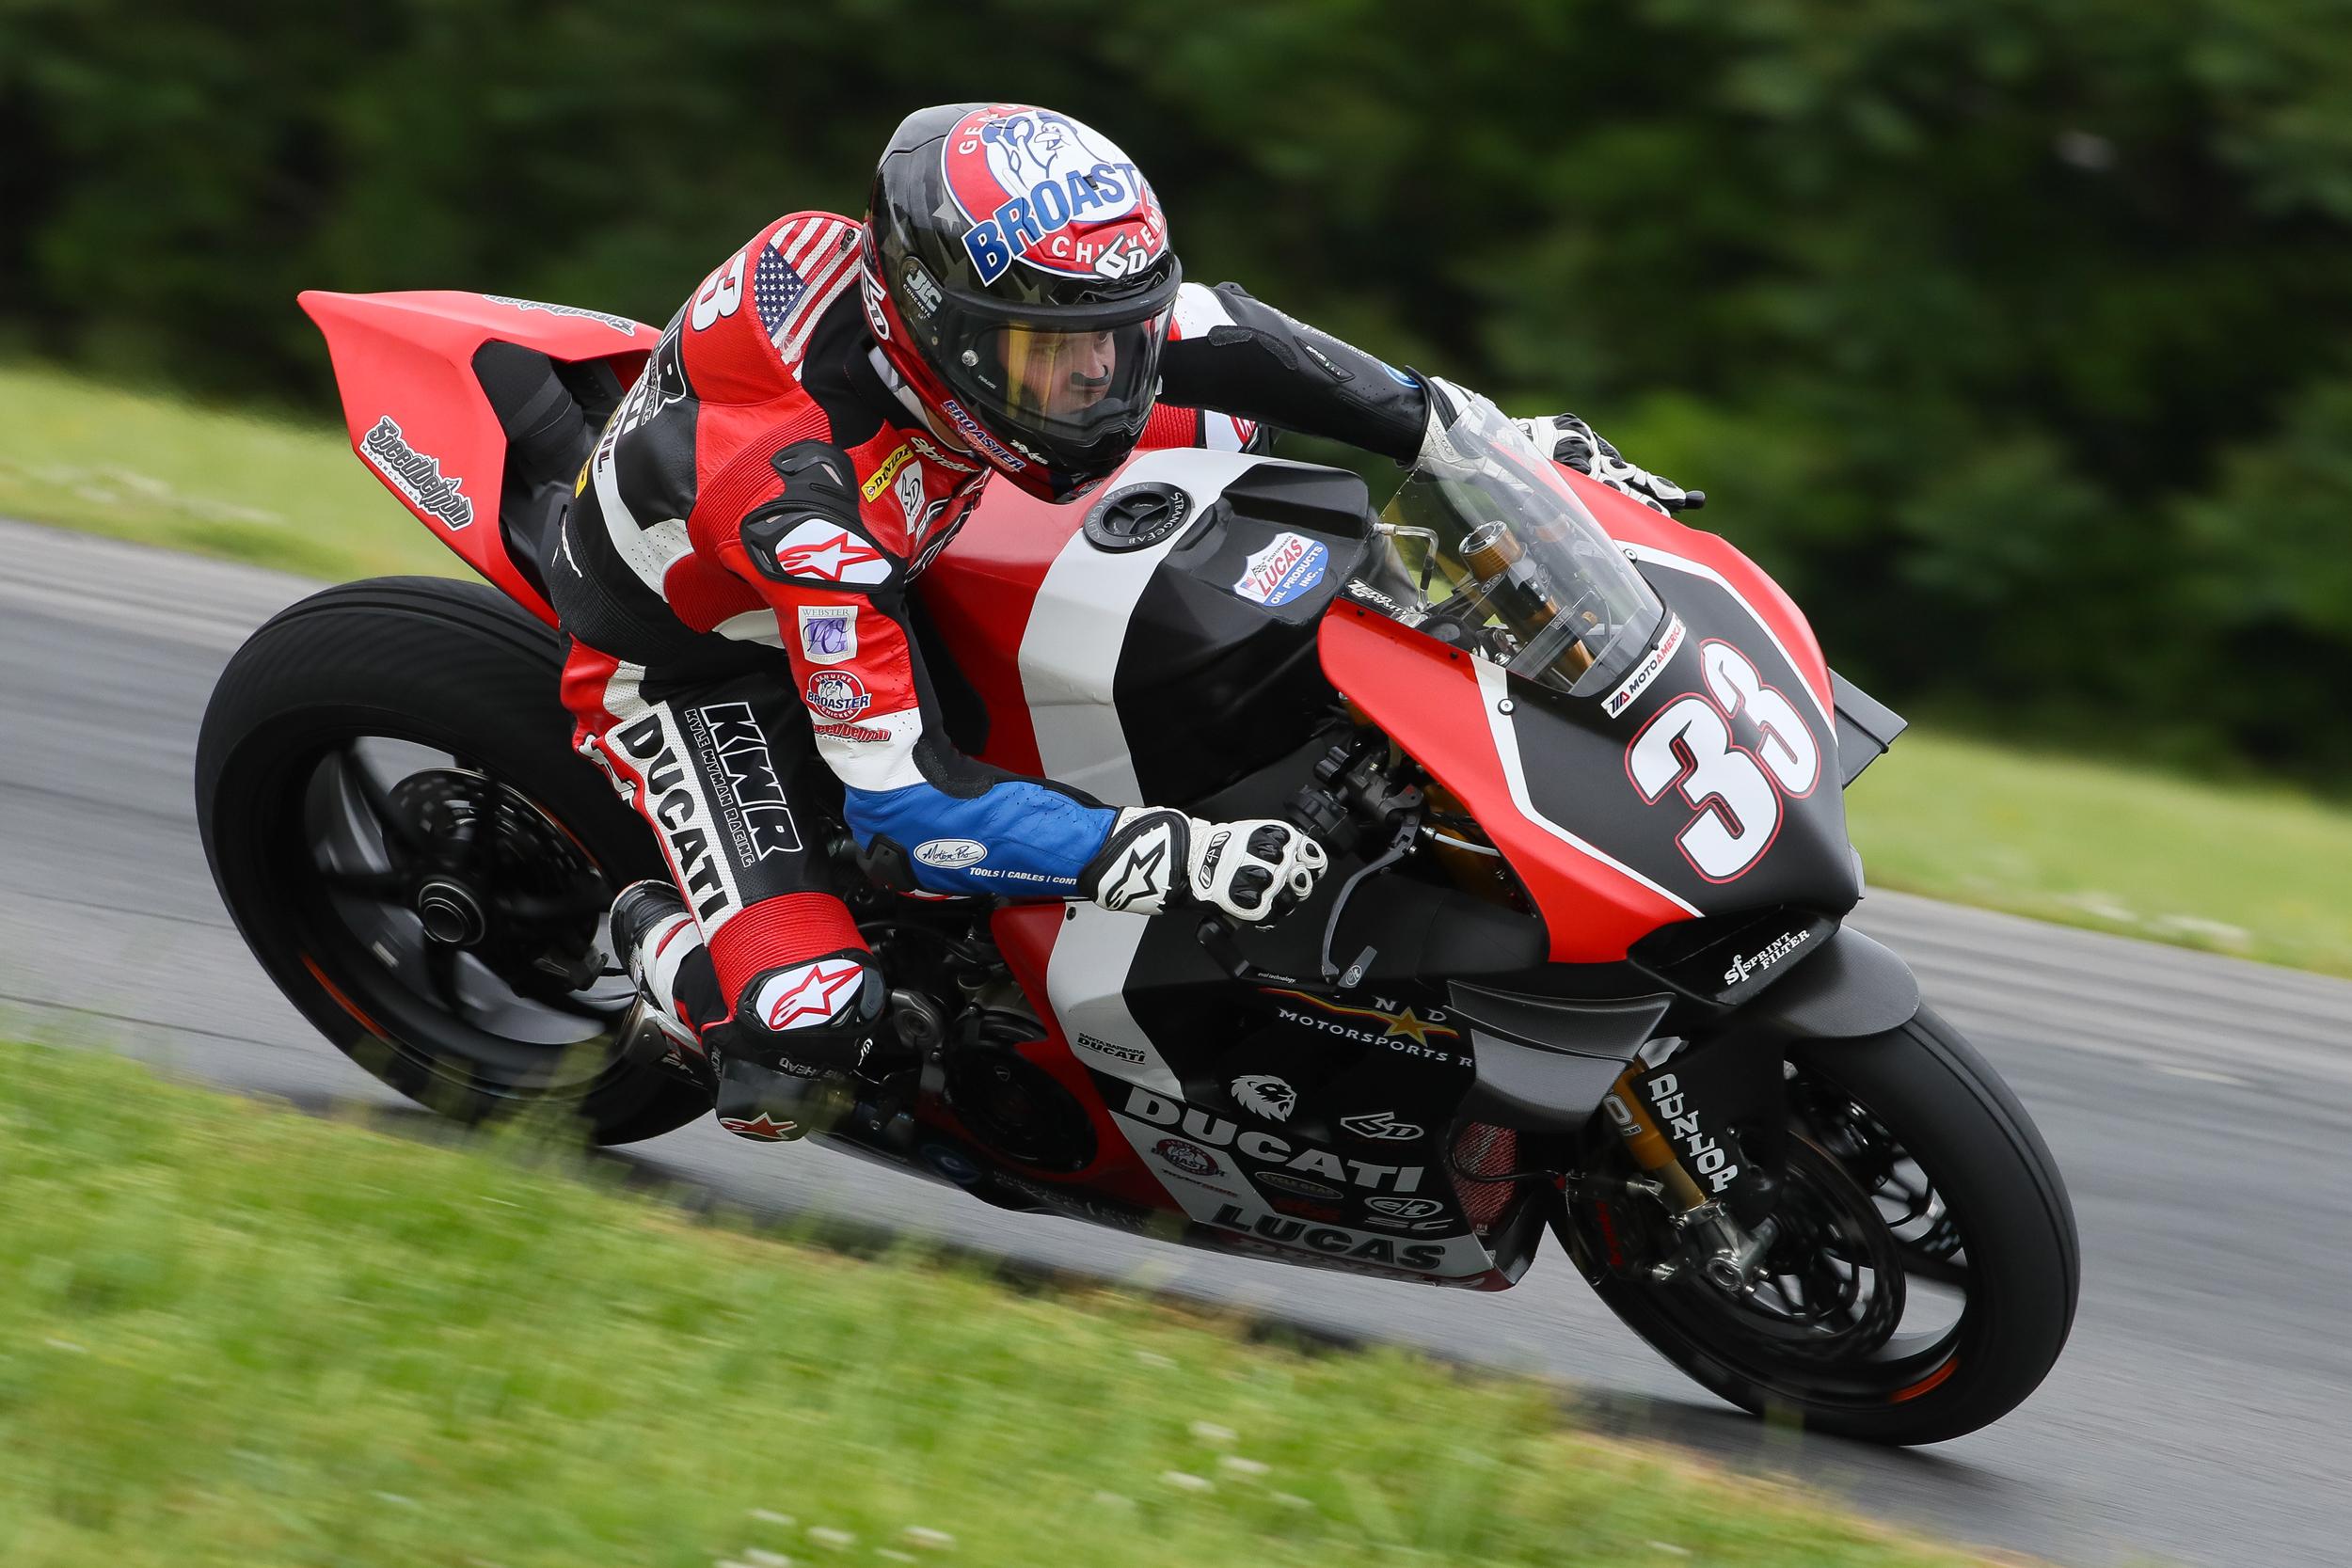 Virginia International Raceway - KWS, Kyle Wyman